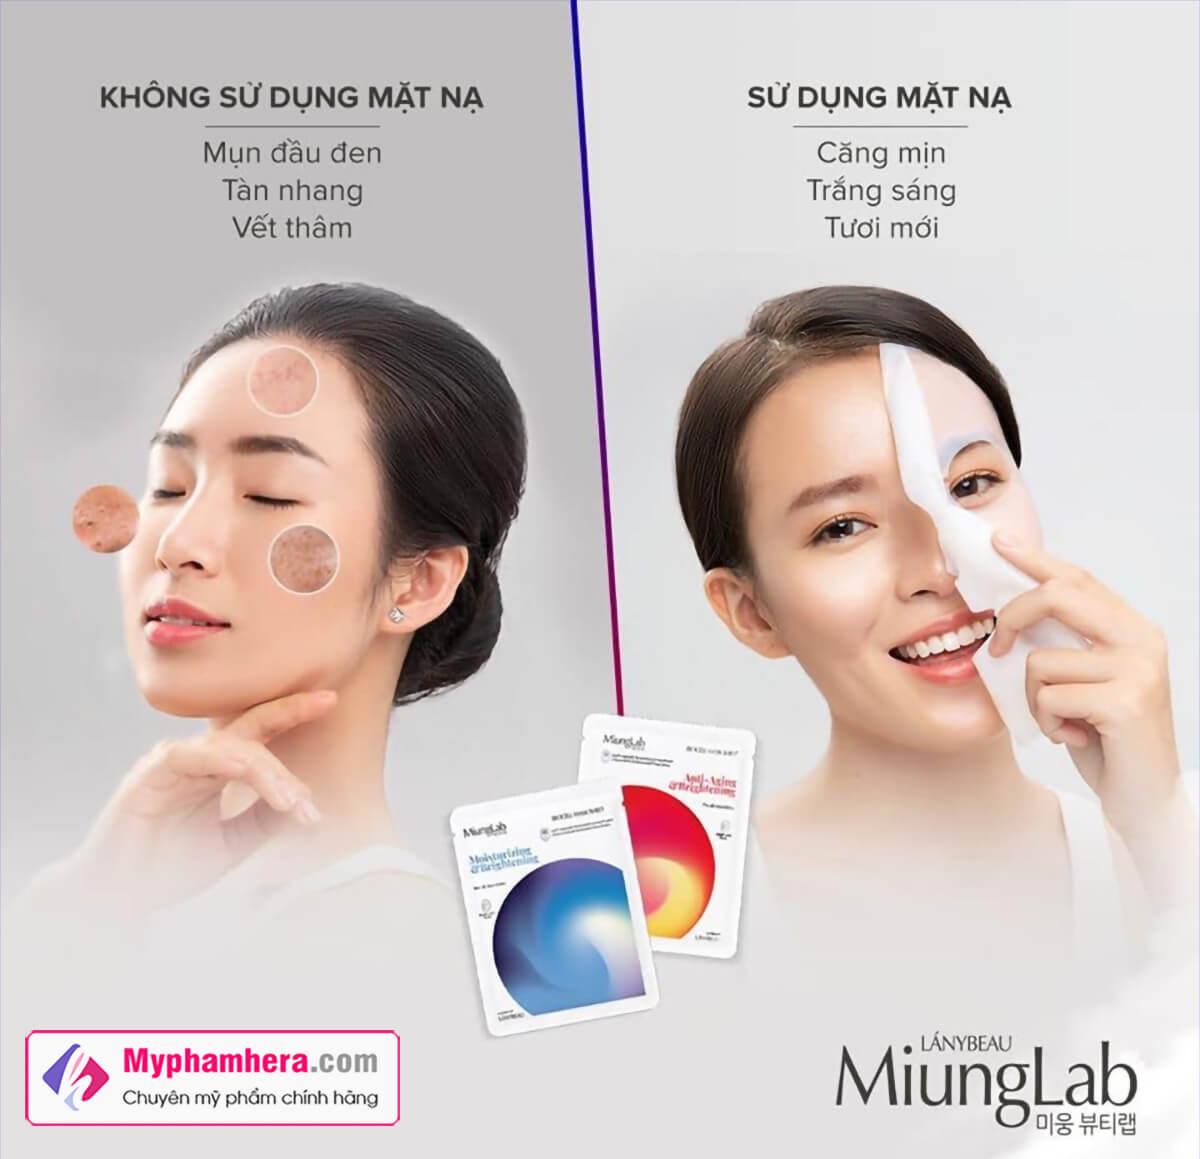 review mặt nạ miung lab hàn quốc myphamhera.com